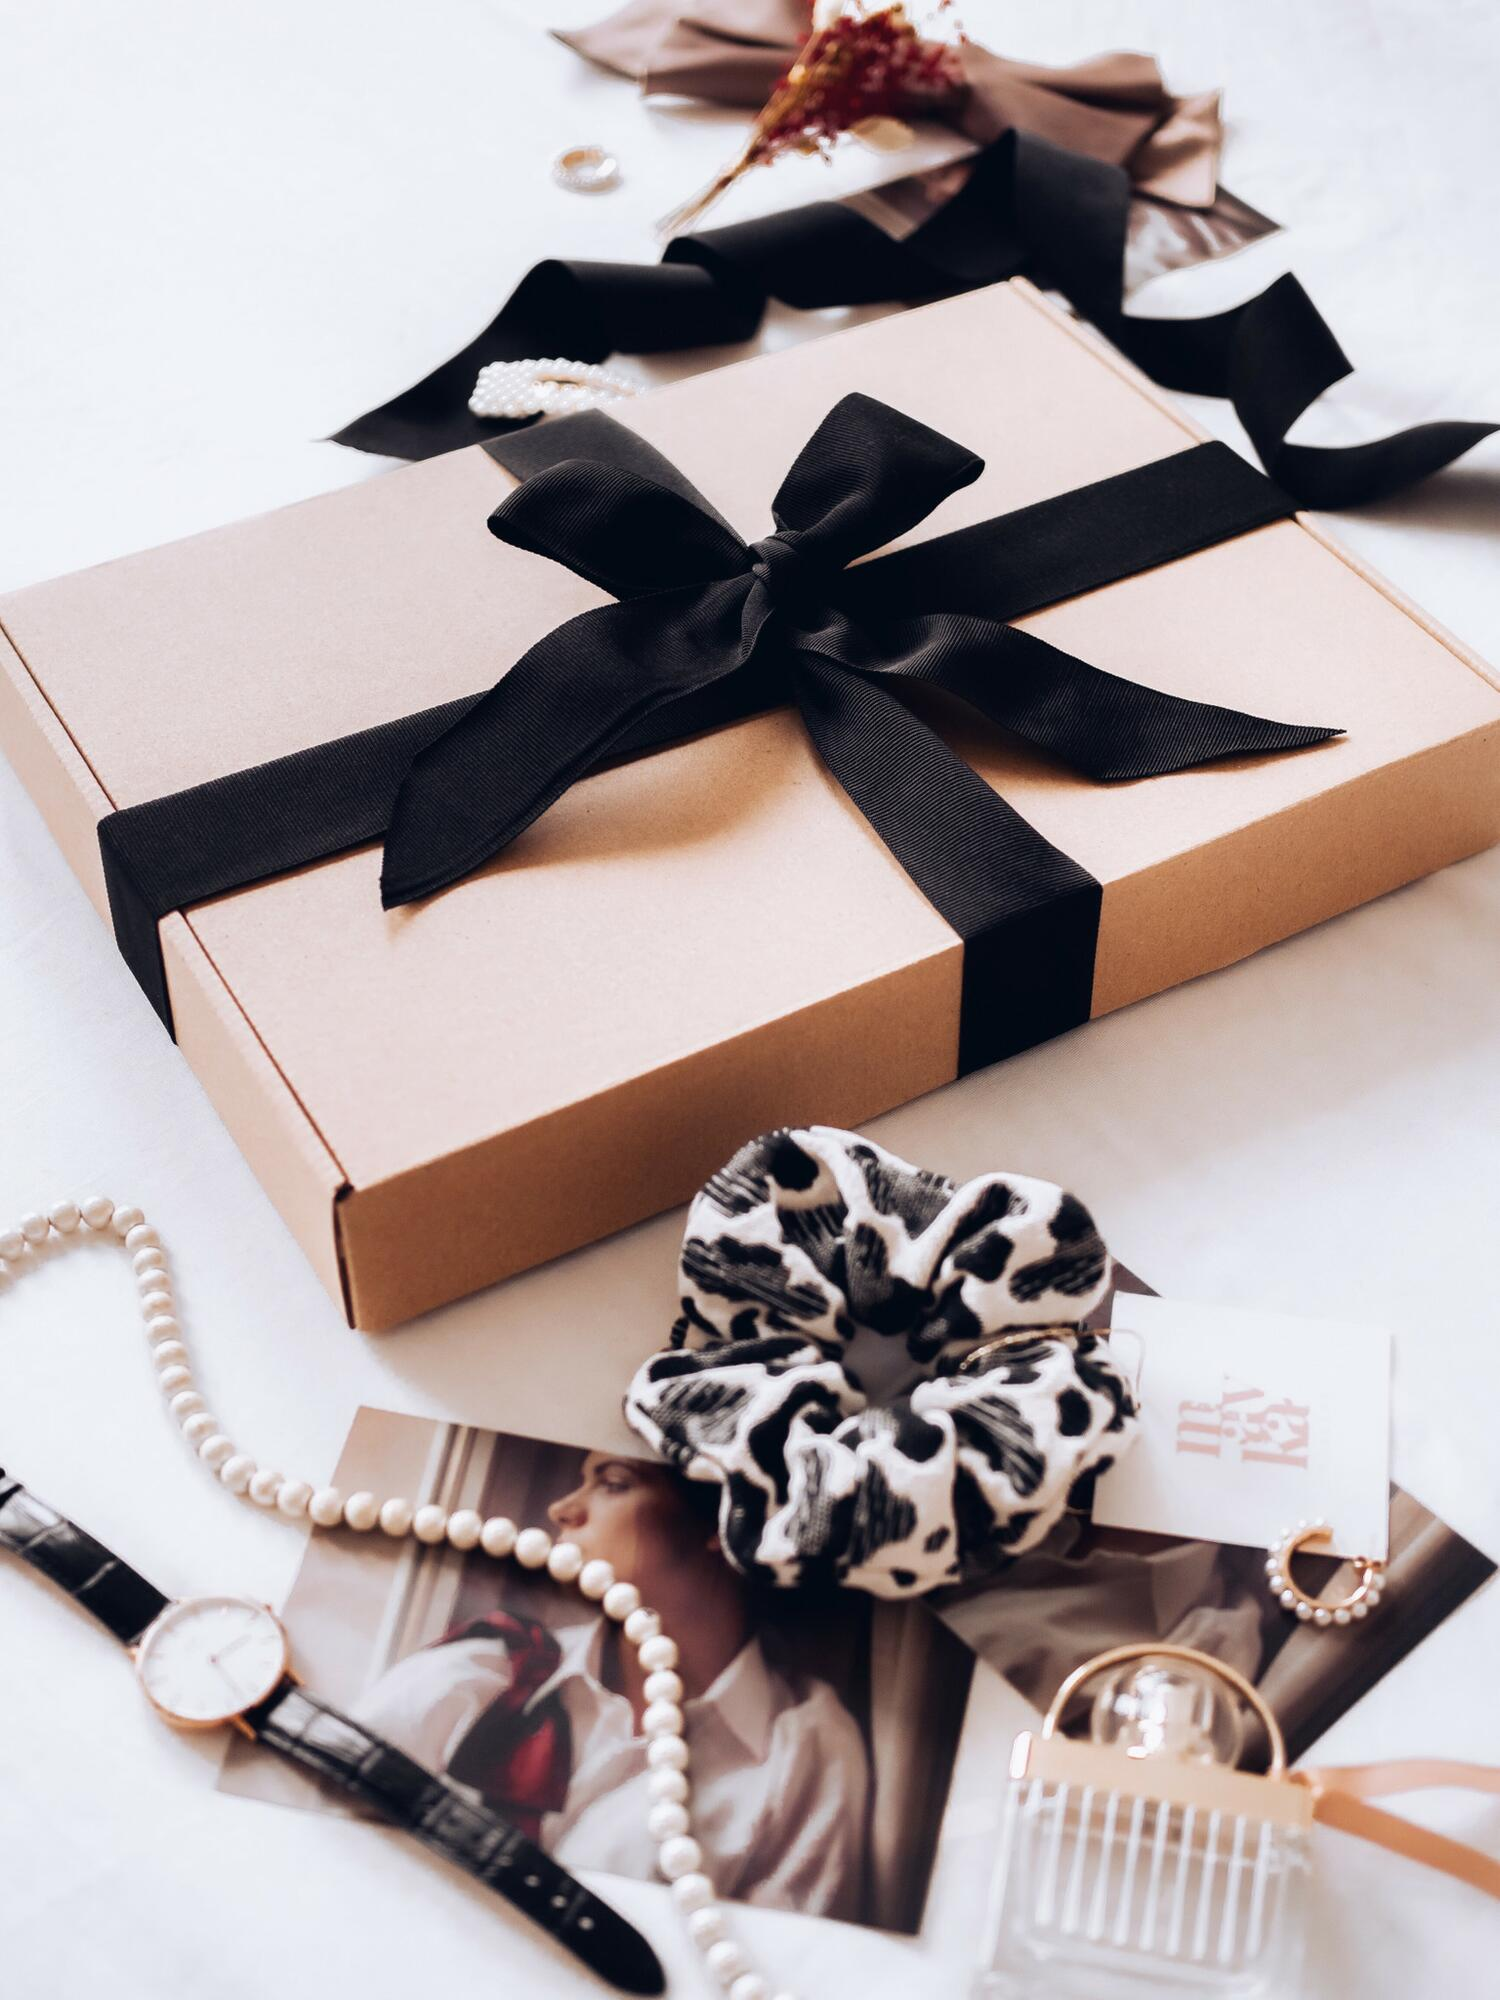 MavkaBox: opaska black pantera + gumka bordo jedwab + pakowanie na prezent - mavka concept   JestemSlow.pl